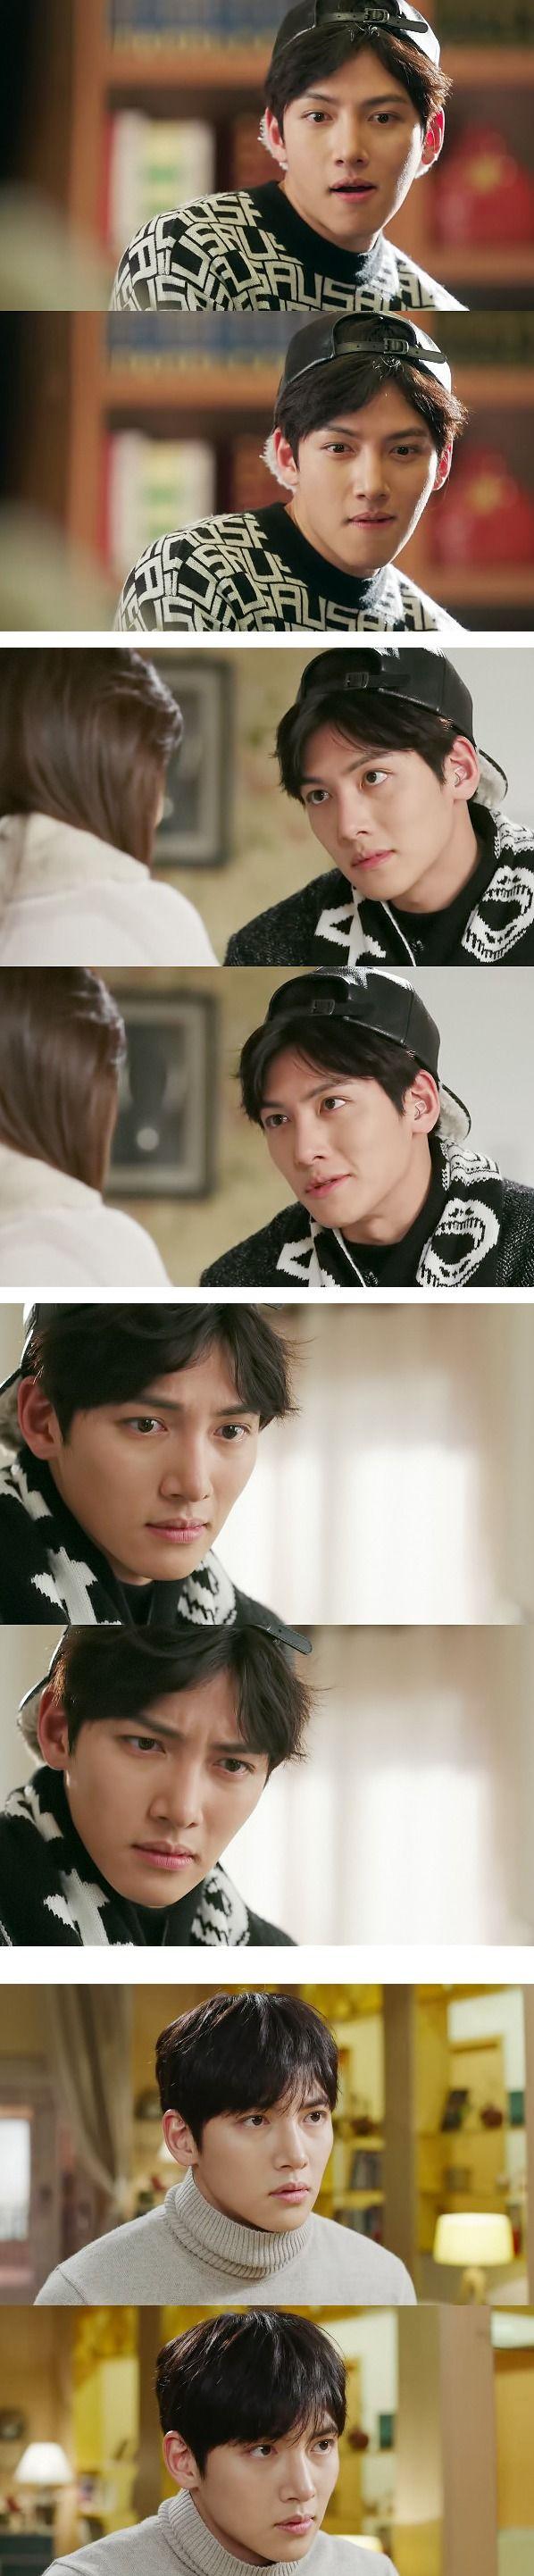 Healer (힐러) Korean - Drama - Episode 12 - Picture @ HanCinema :: The Korean Movie and Drama Database